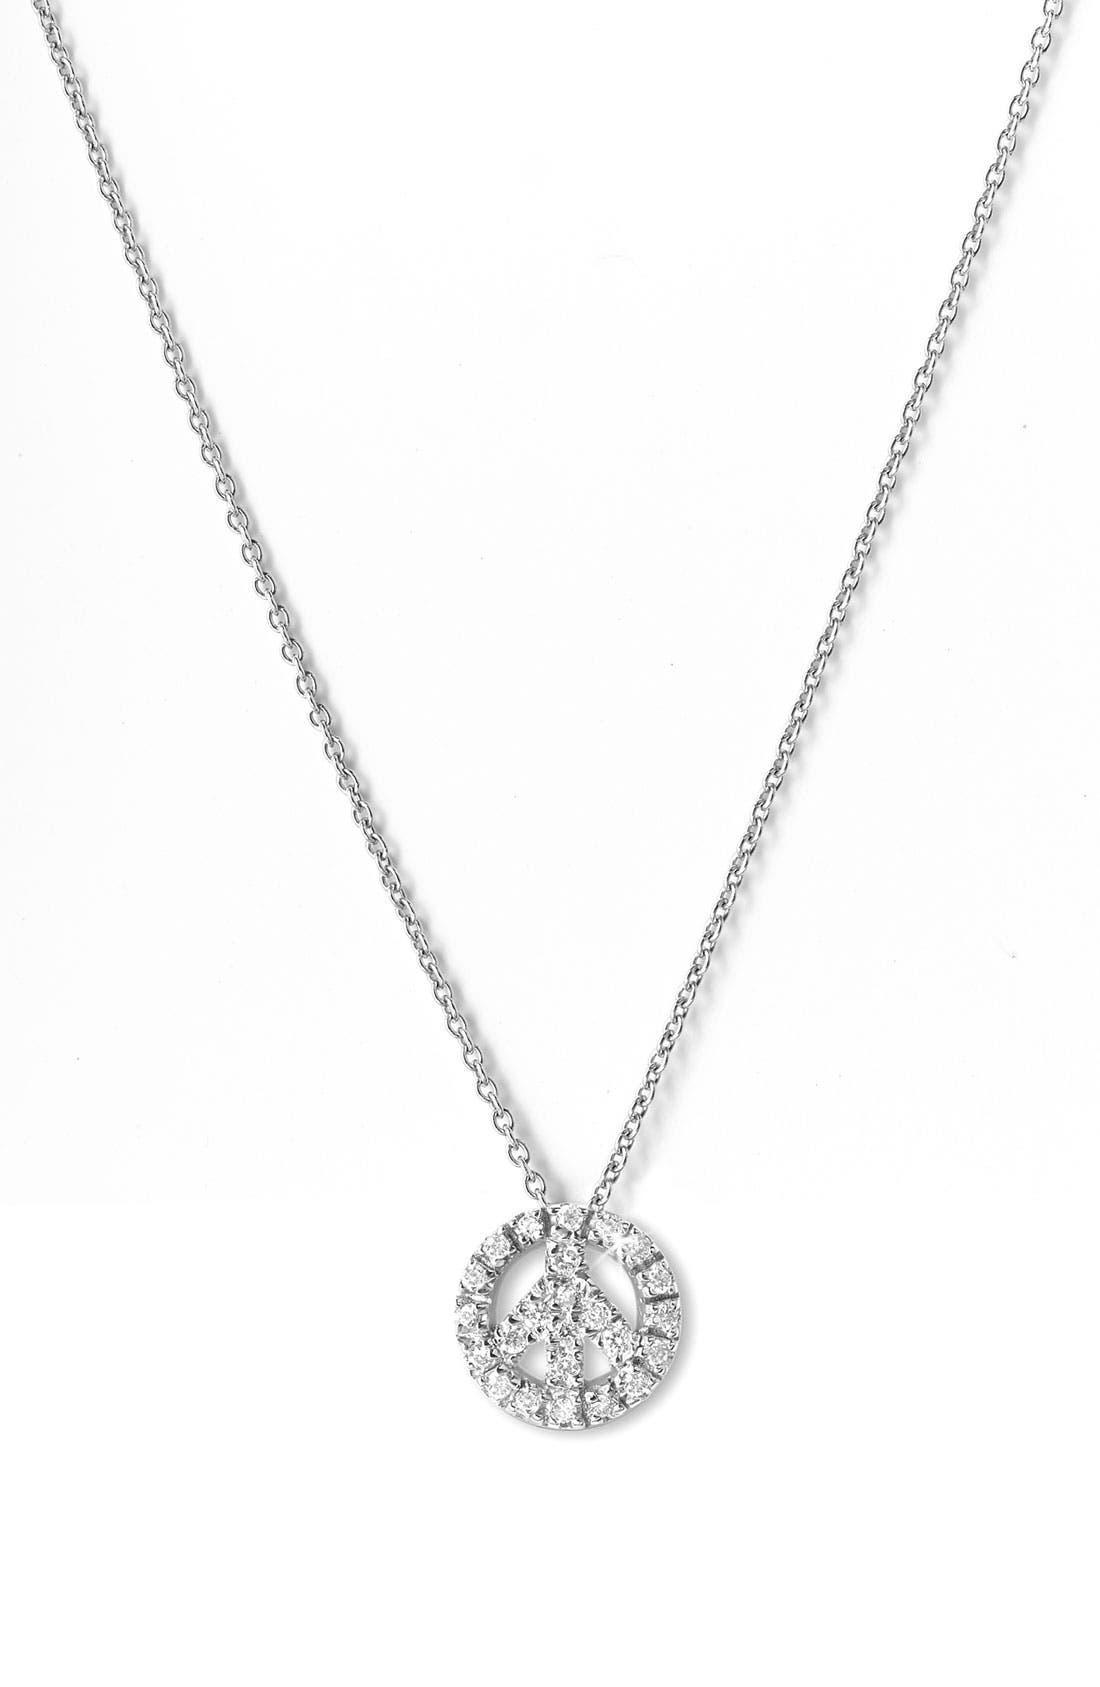 Main Image - Roberto Coin 'Tiny Treasures' Peace Sign Necklace